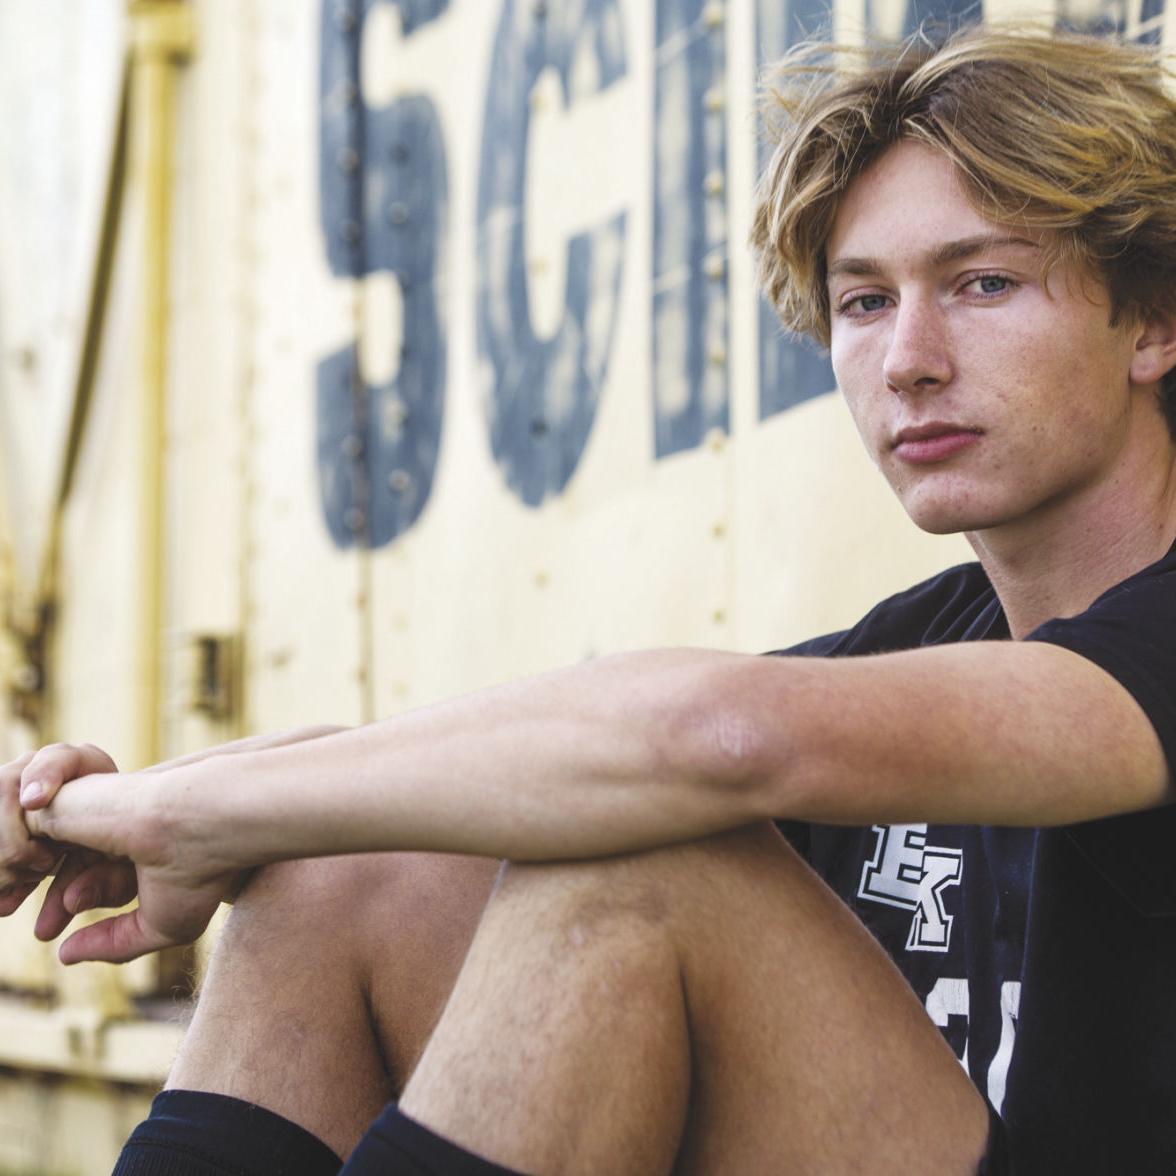 Prolific scorer Colton Crawford has helped lead resurgence of Bishop Kelly boys soccer program